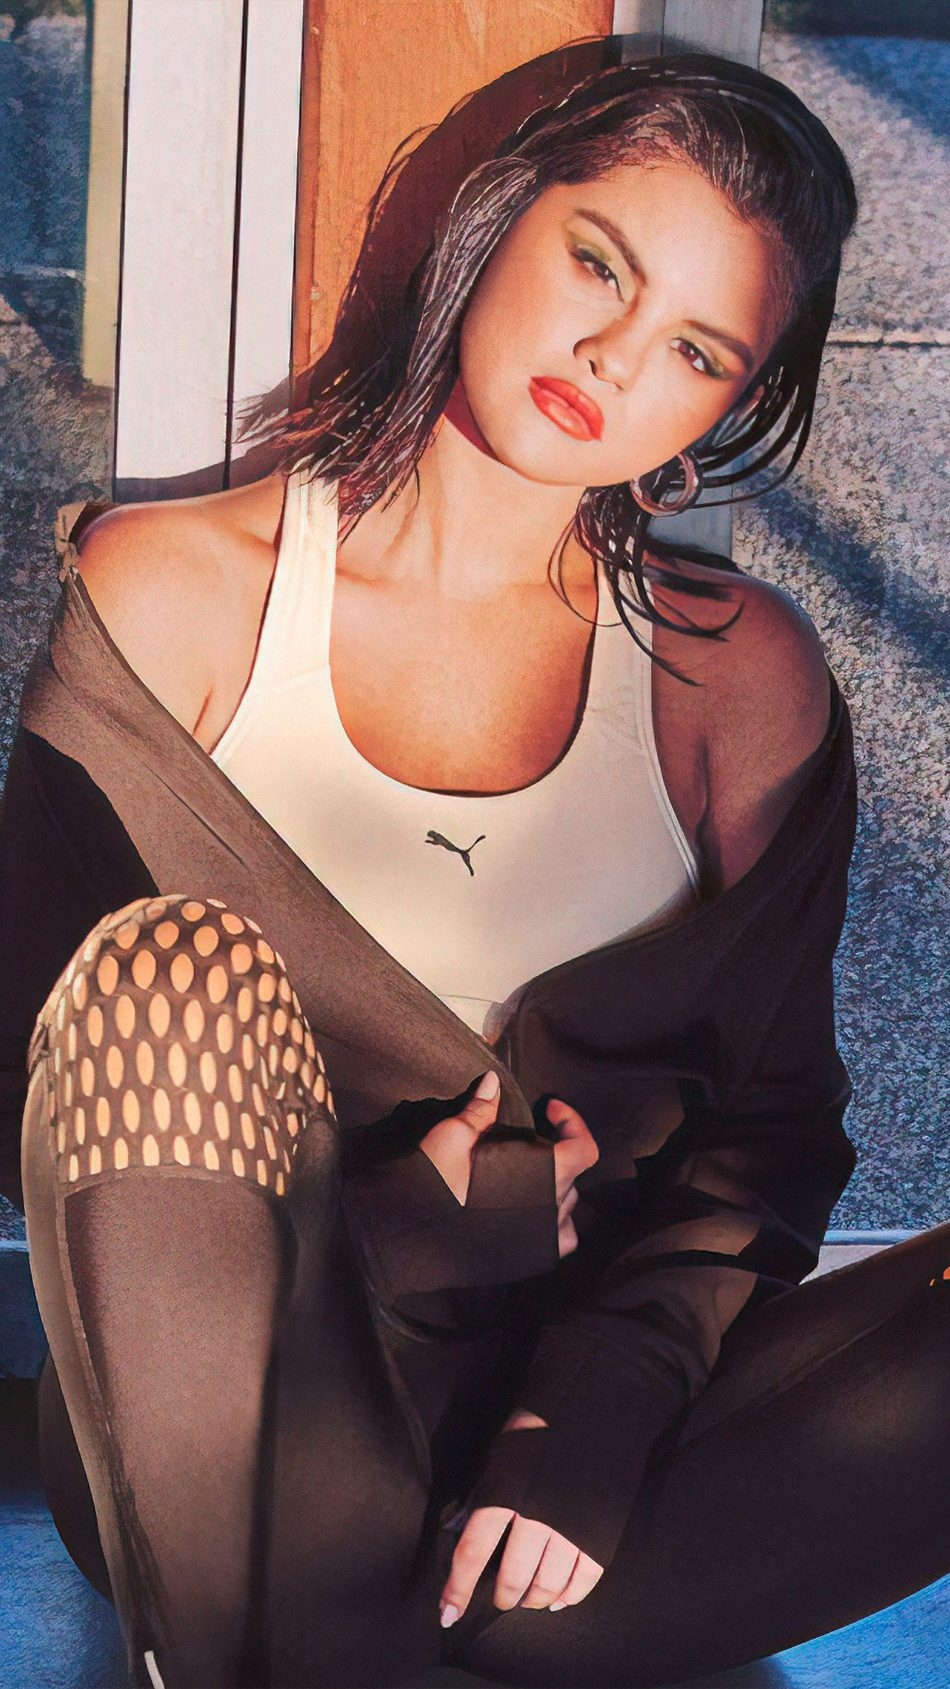 Selena Gomez Puma Mirror Reflection Photoshoot 4K Ultra HD Mobile Wallpaper